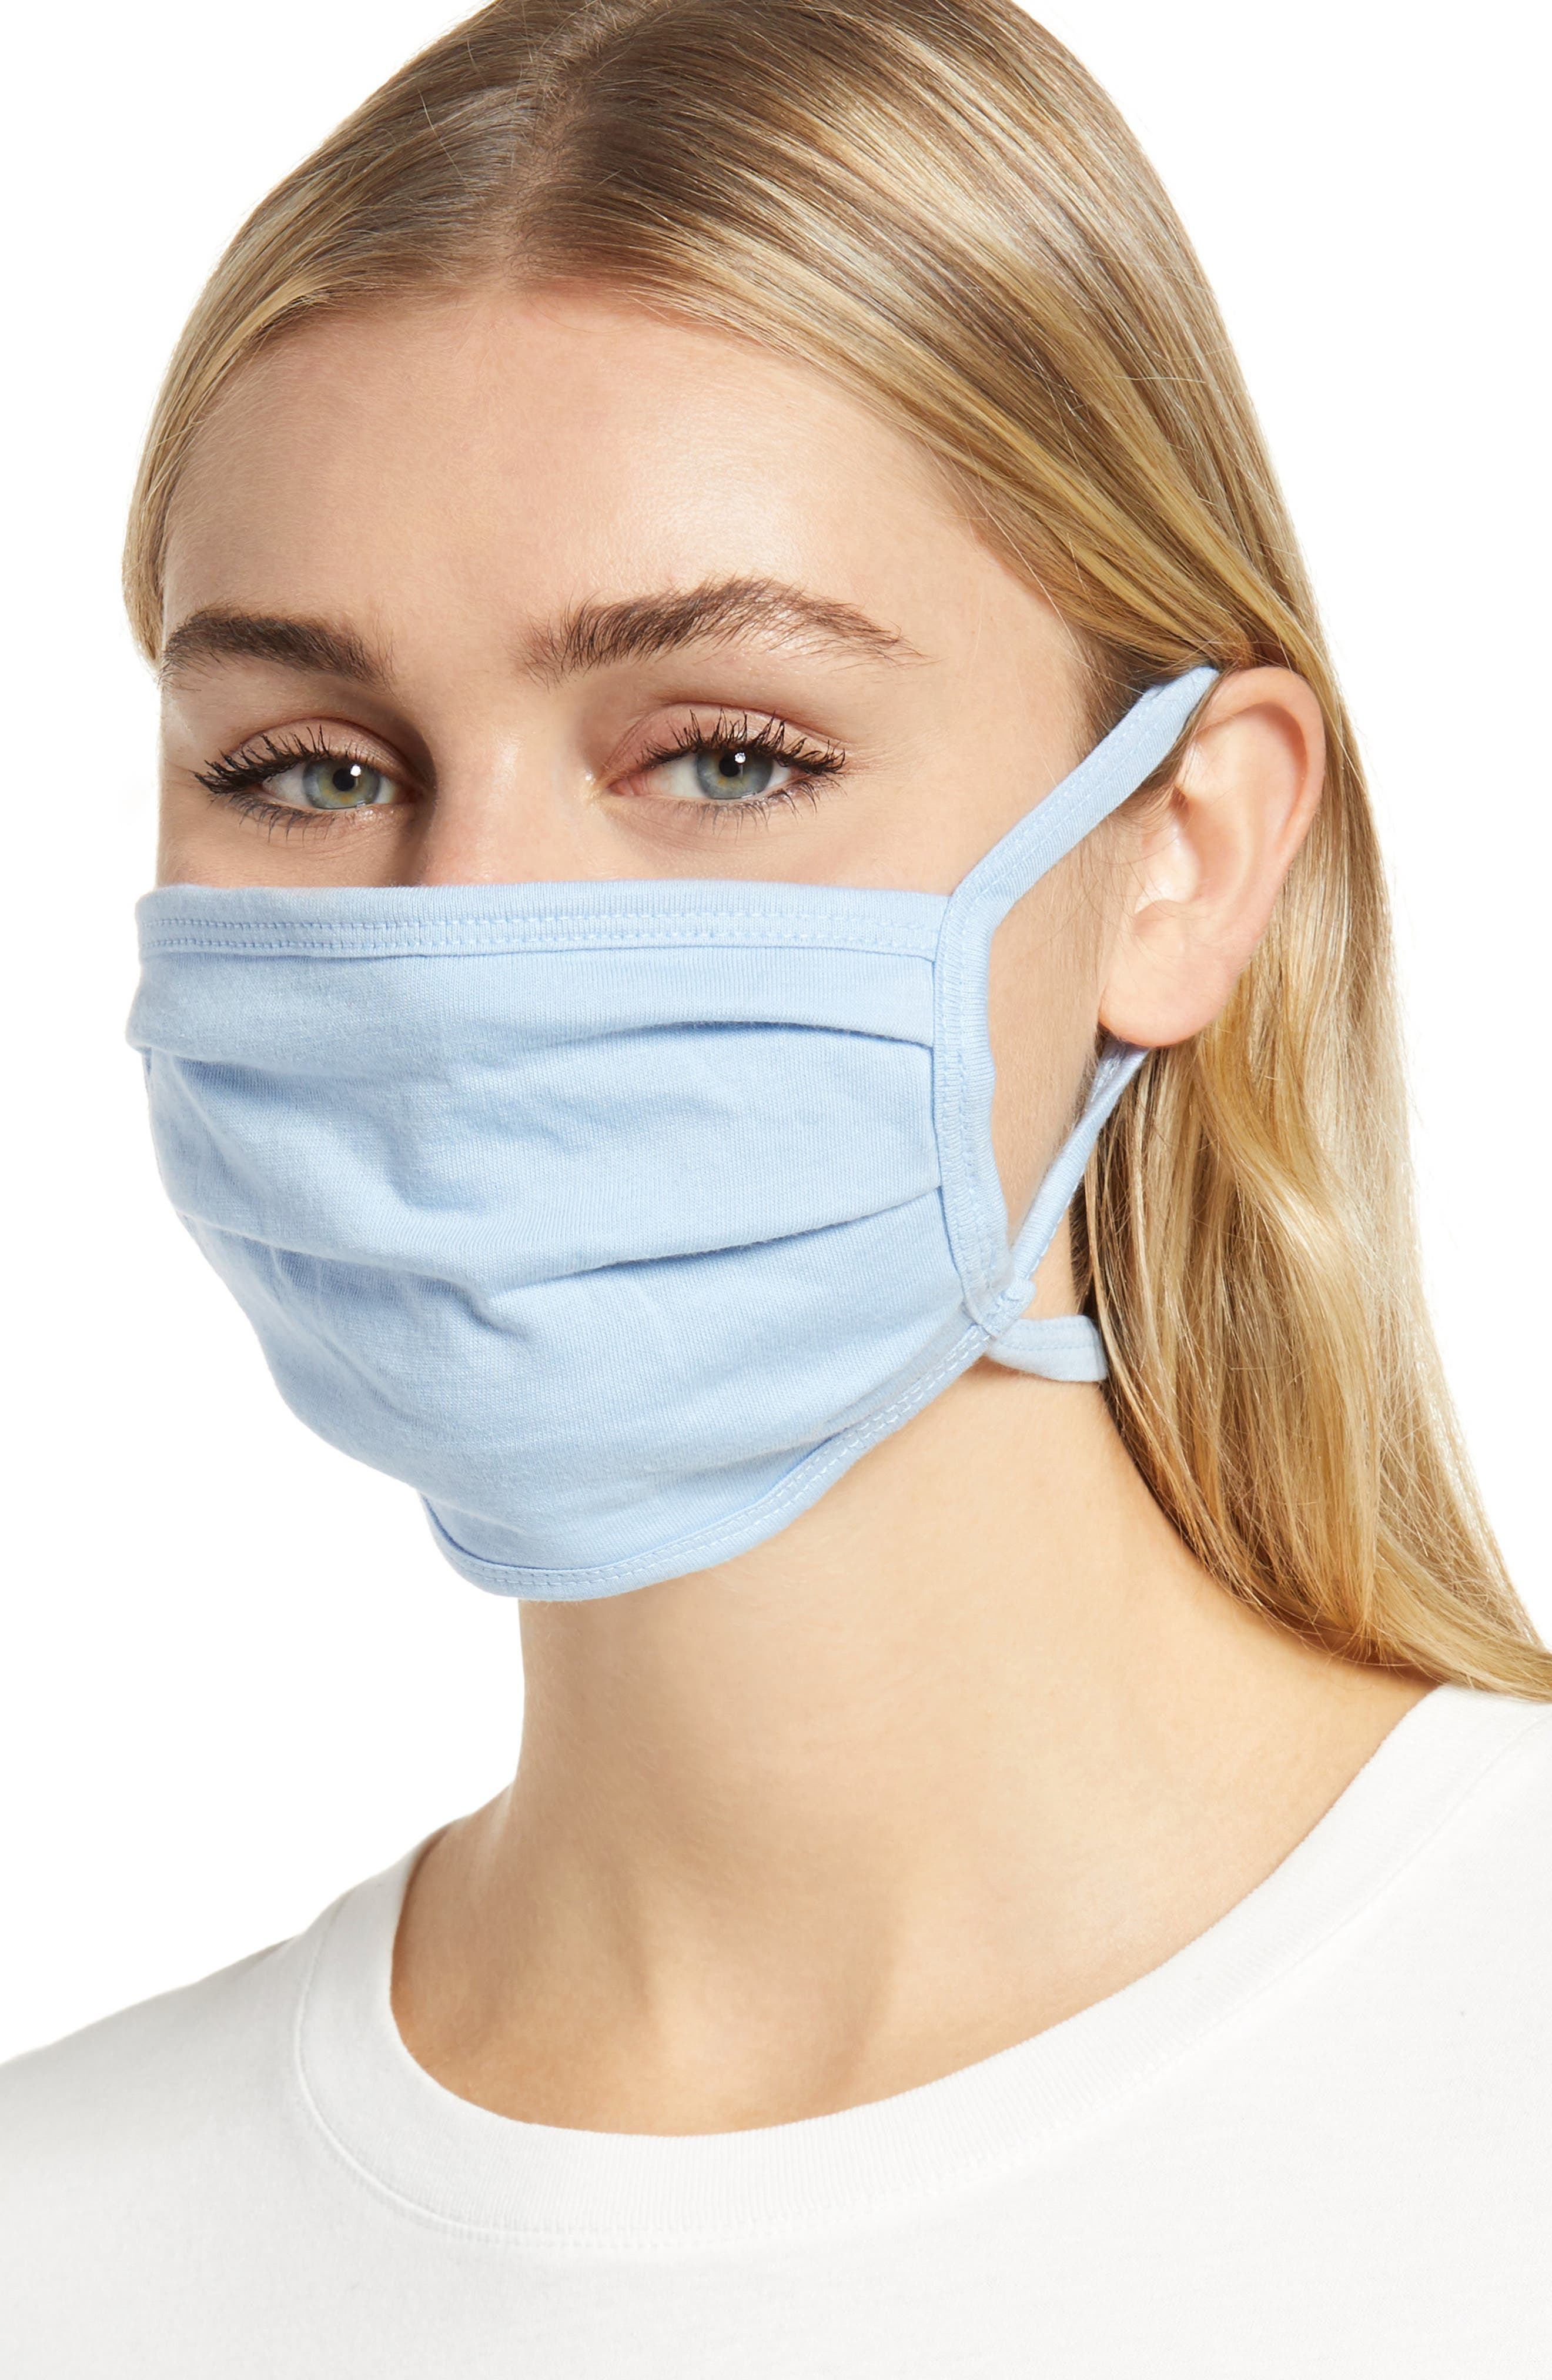 Image of Nordstrom Solid Non-Medical Adult Face Masks - Set of 4